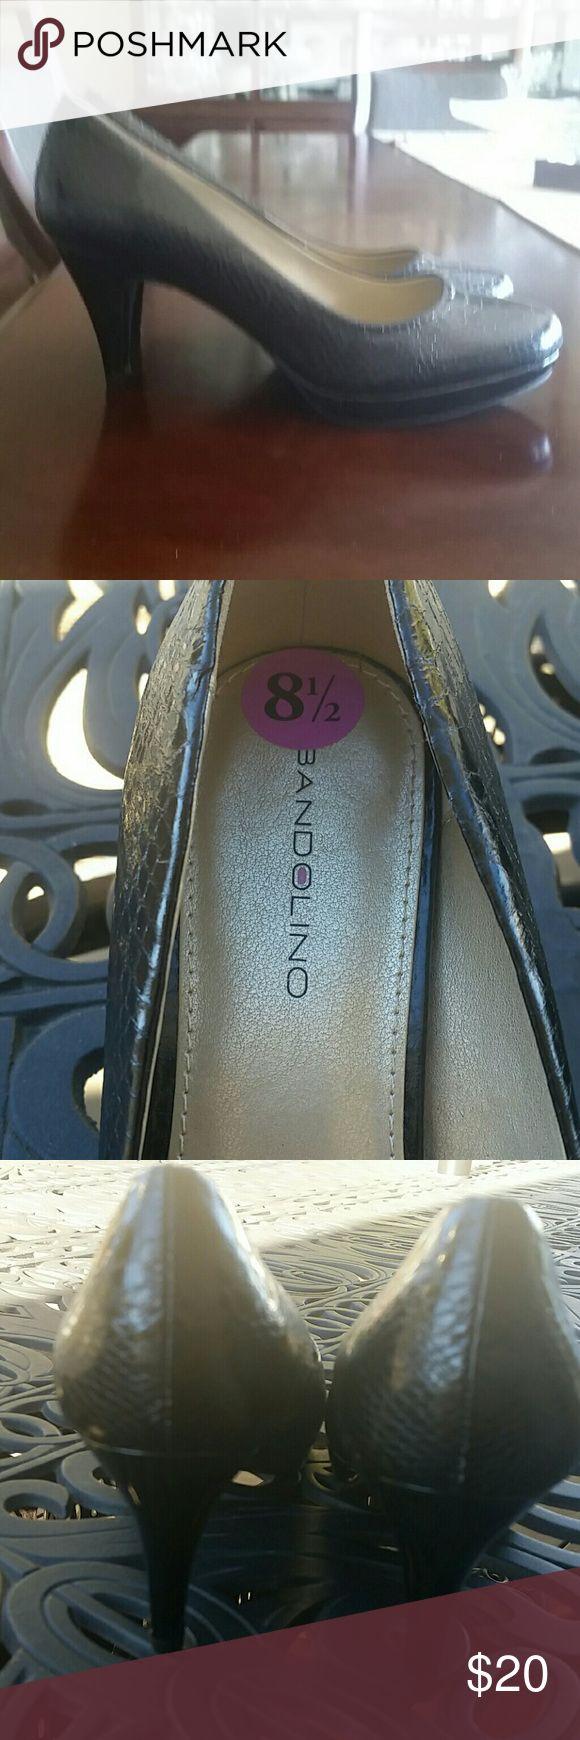 Bandolino comfy heels!!! Gently loved snakeskin look pumps. Medium heel. Bandolino Shoes Heels